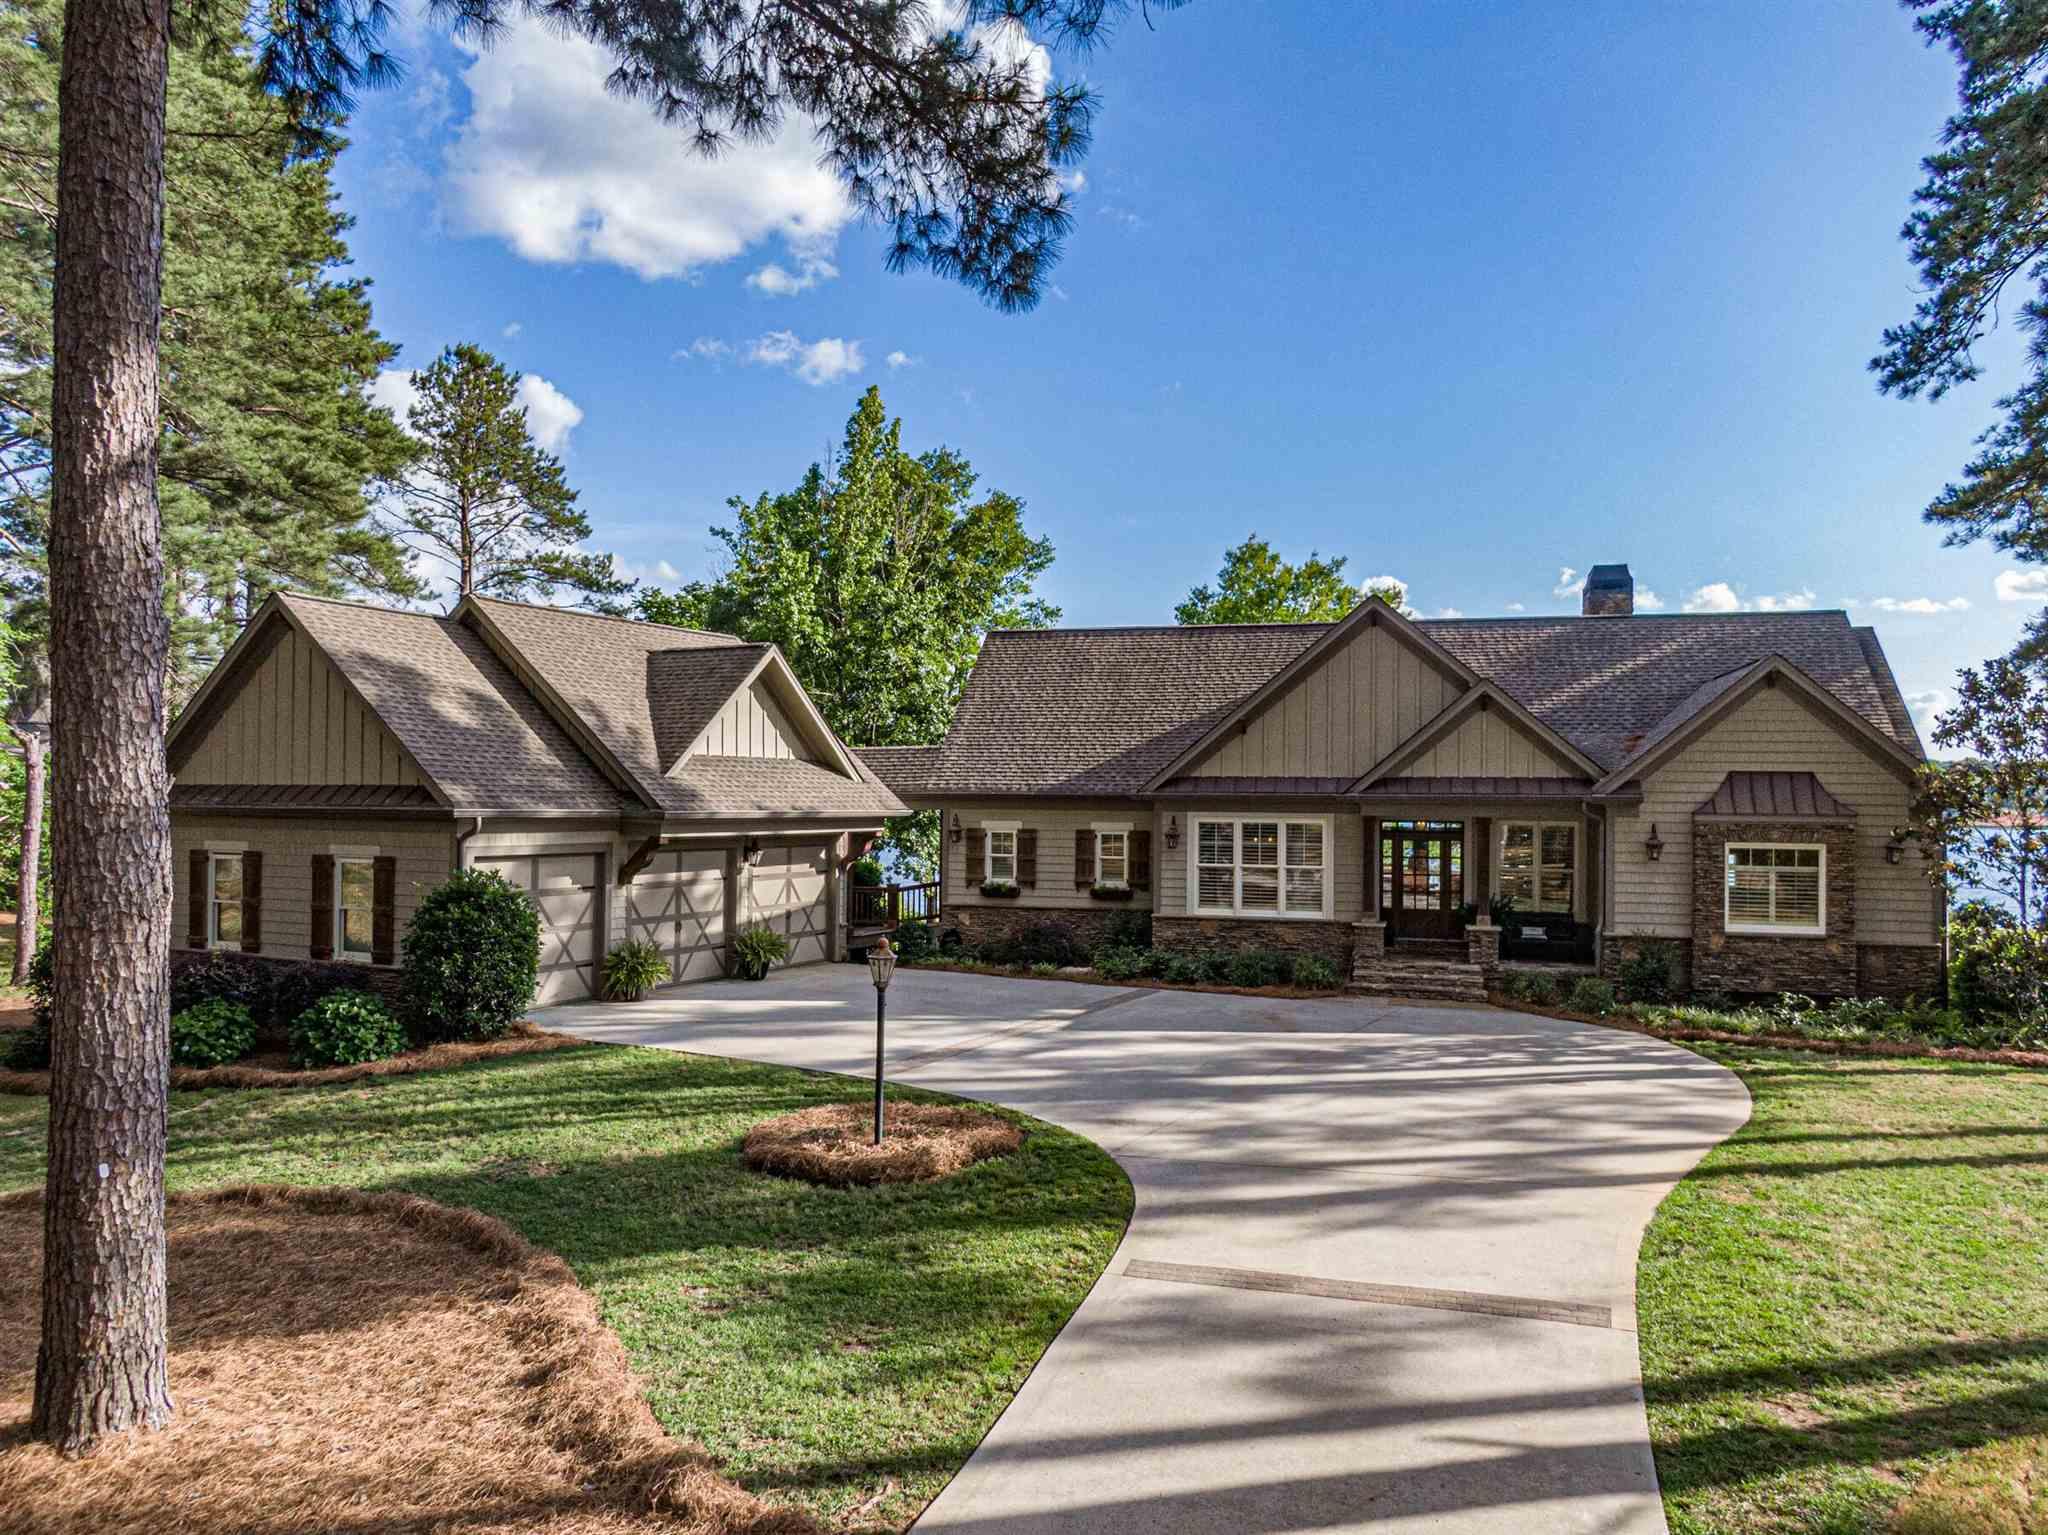 146 WILDWOOD DRIVE, Lake Oconee in Putnam County, GA 31024 Home for Sale